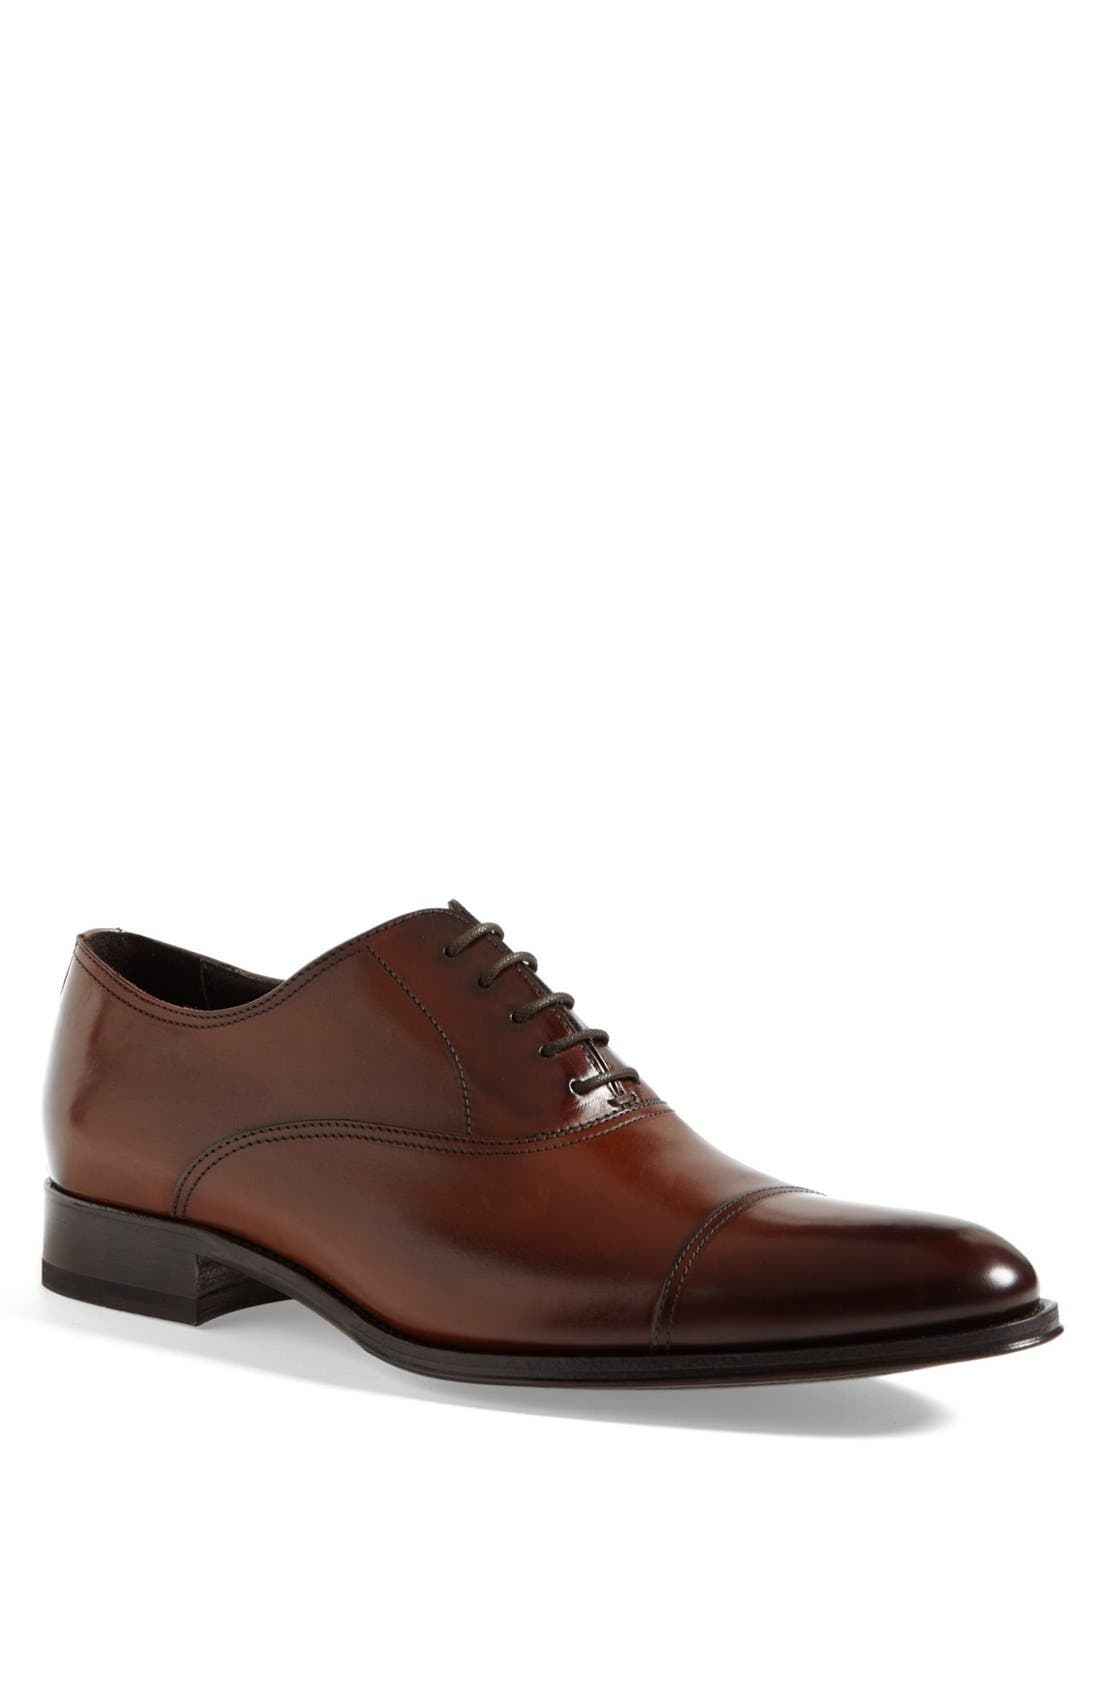 To Boot New York Brandon Cap Toe Oxford (Nordstrom Exclusive) (Men)